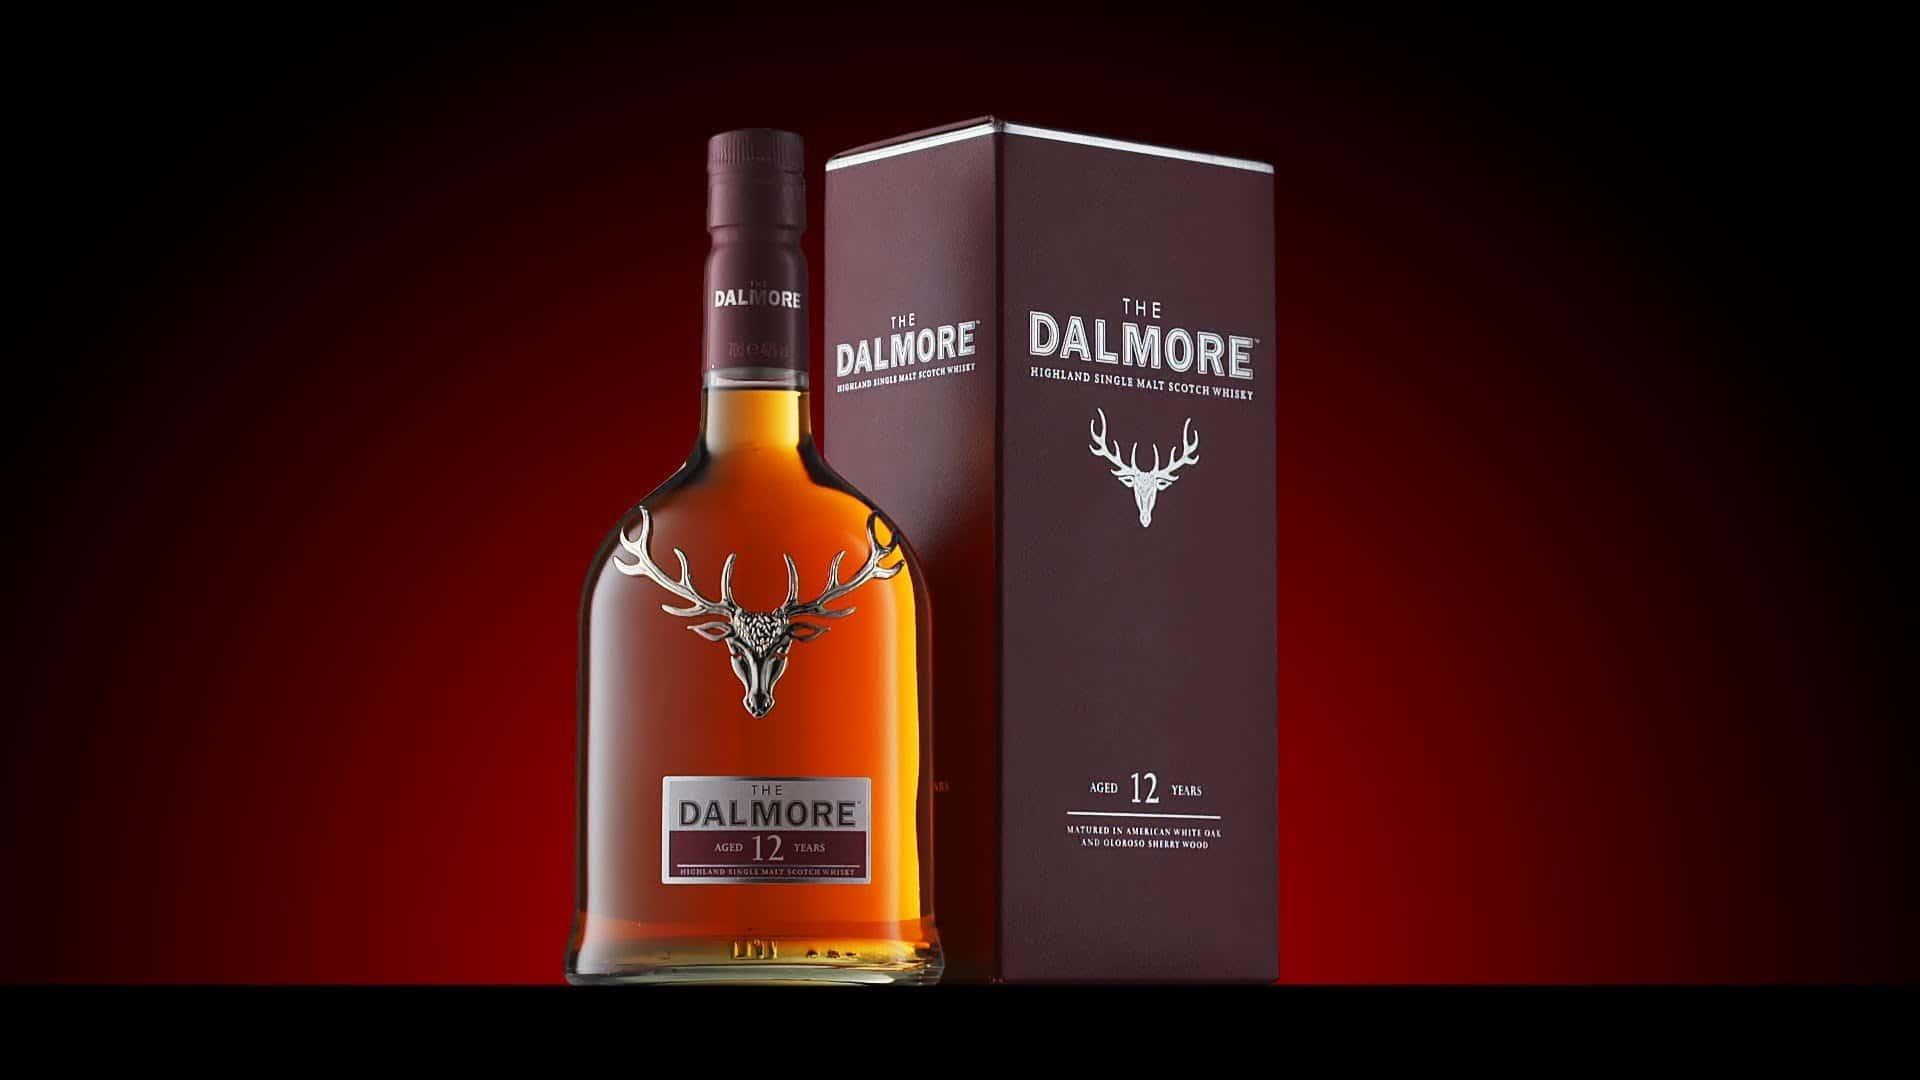 Виски далмор (dalmore) - 12, 15, 18 лет выдержки